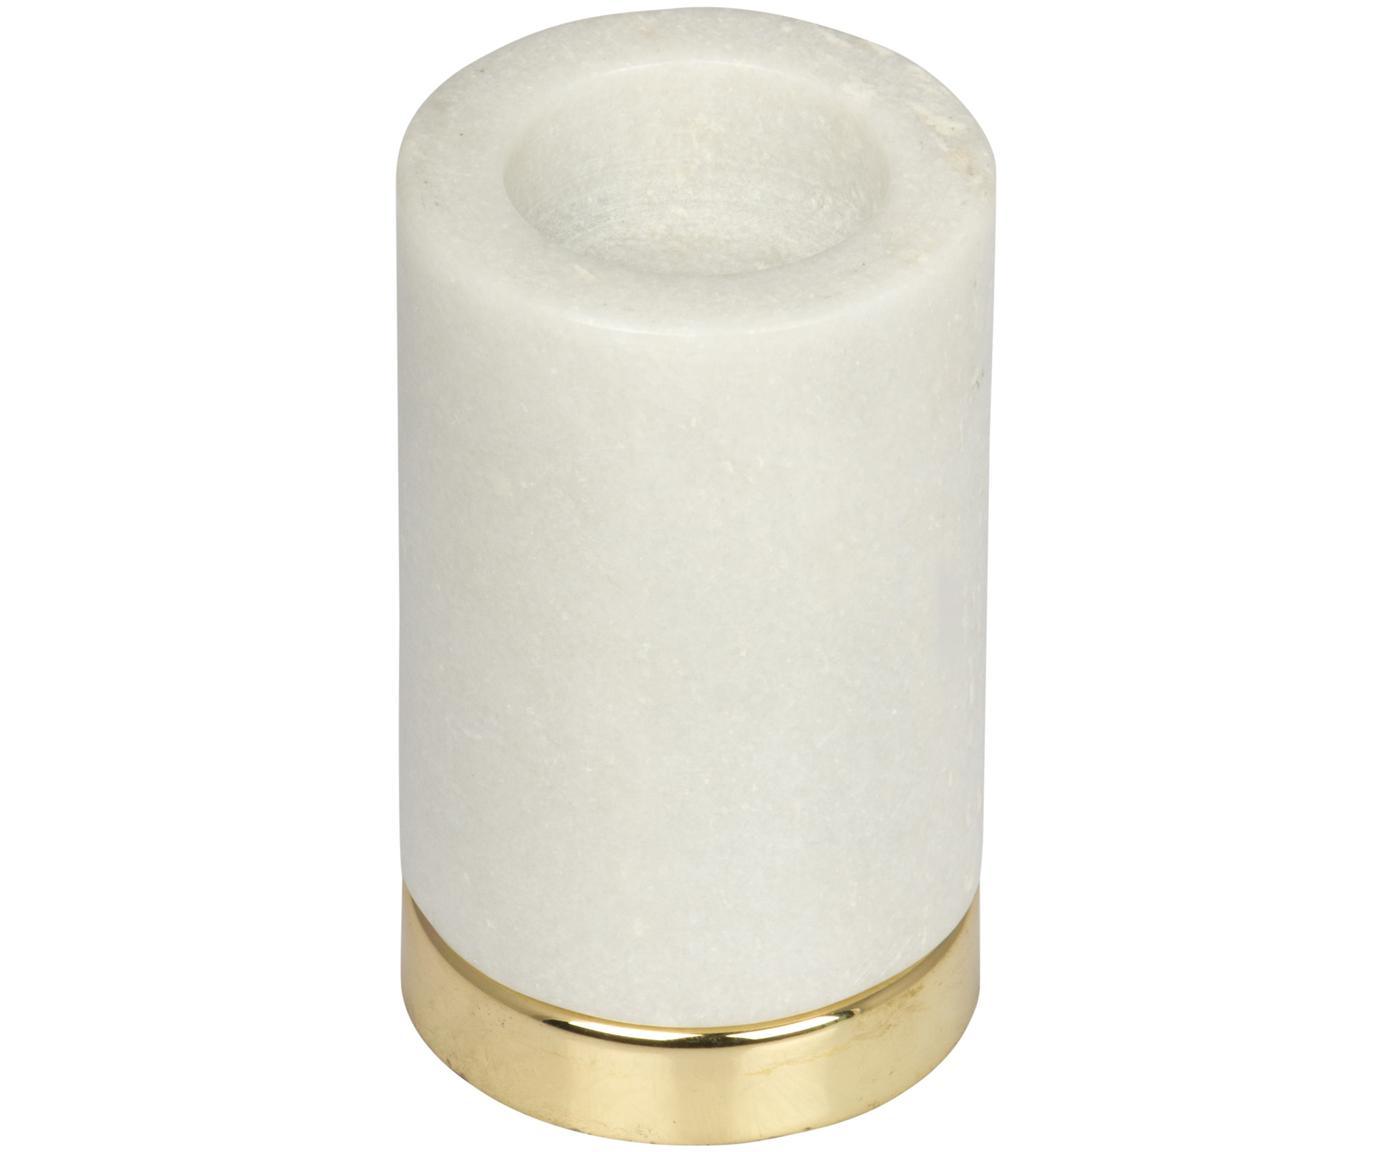 Teelichthalter Porter, Sockel: Metall, vermessingt, Kerzenhalter: Marmor, Weiß, Messing, Ø 7 x H 11 cm